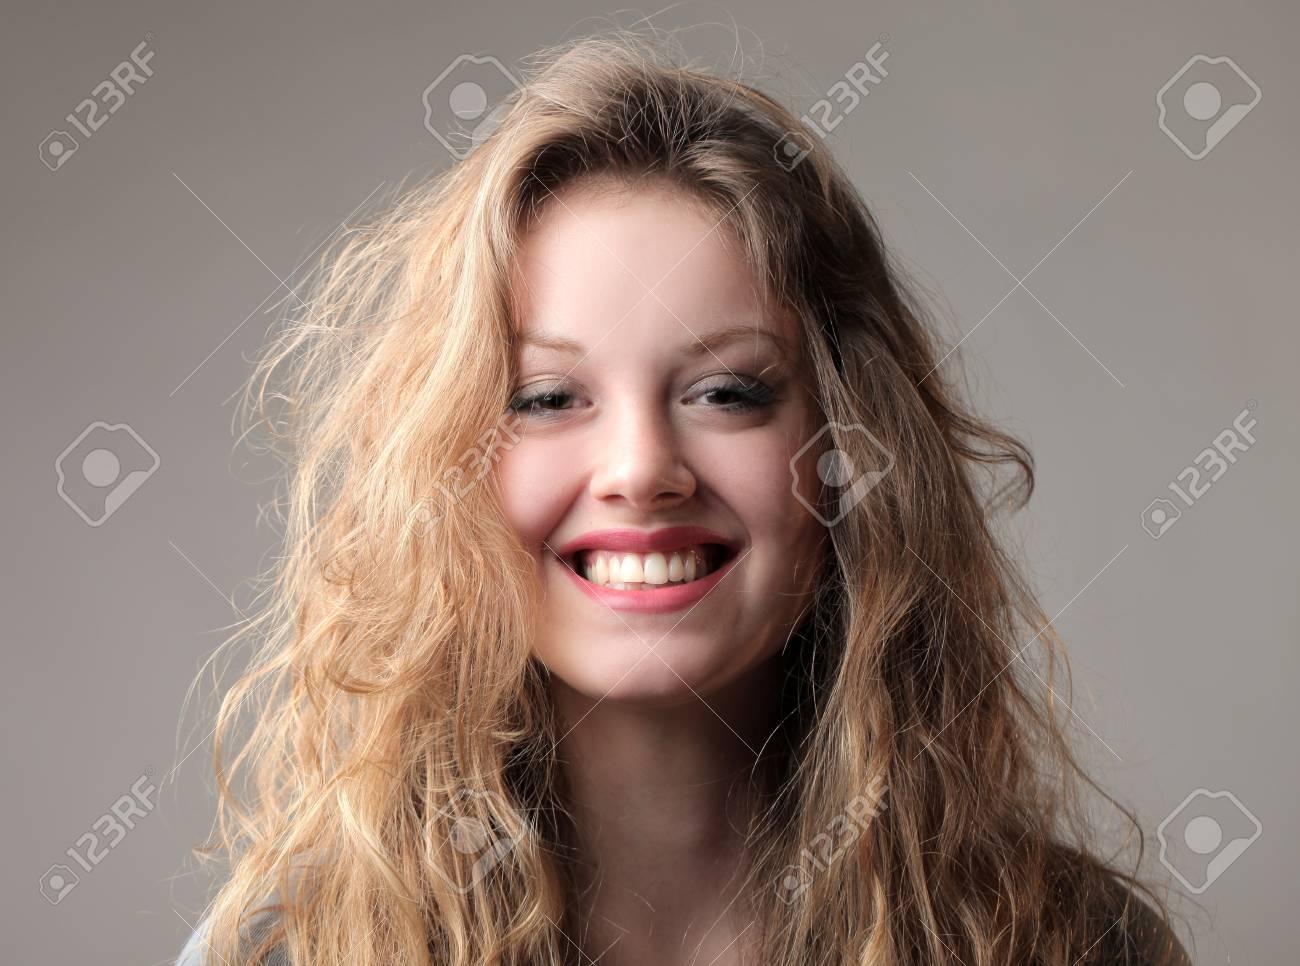 Happy beautiful woman smiling Stock Photo - 12199707